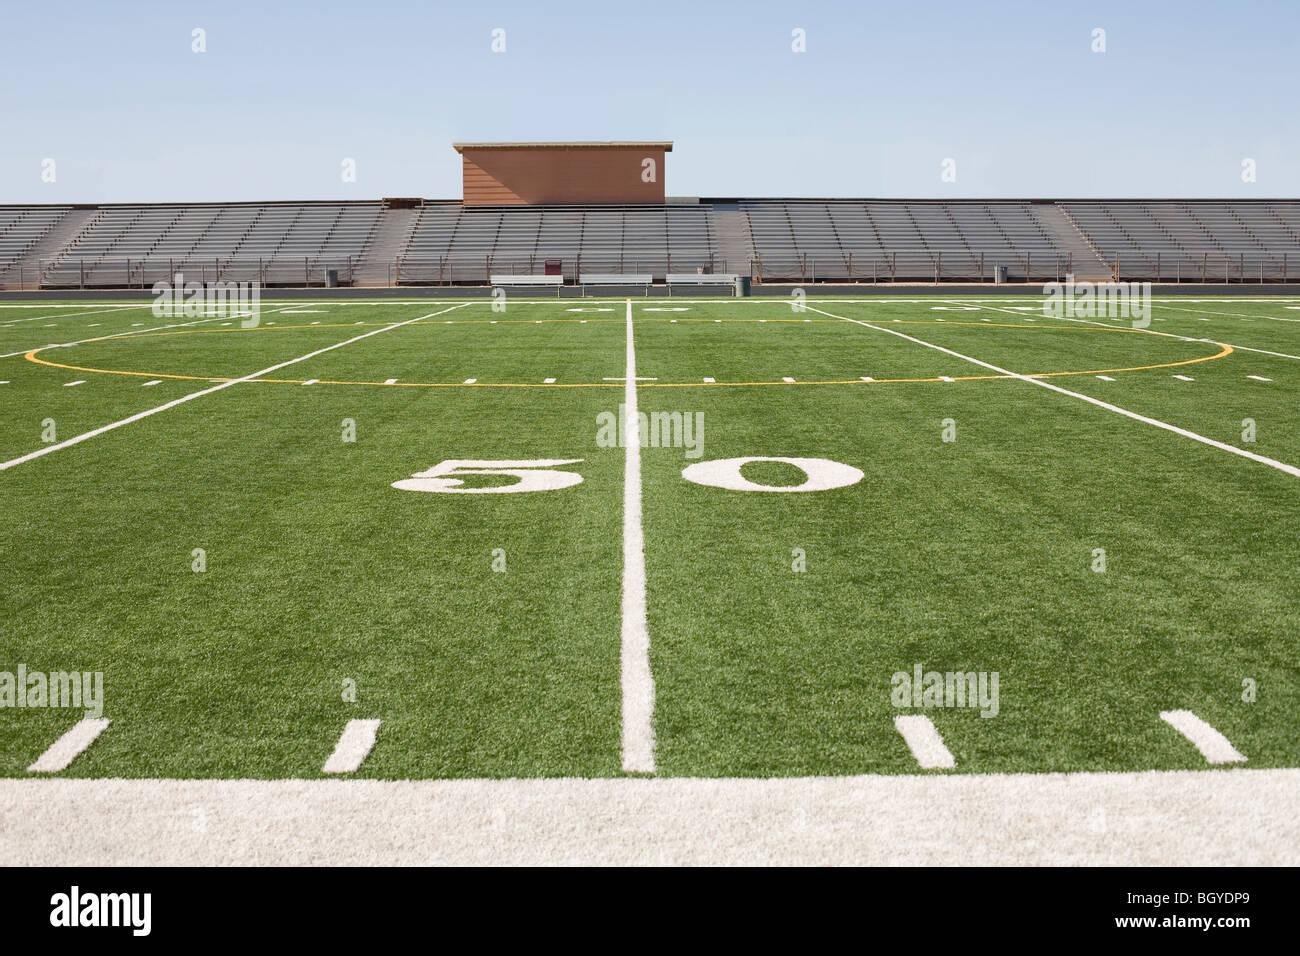 Football field and stadium - Stock Image